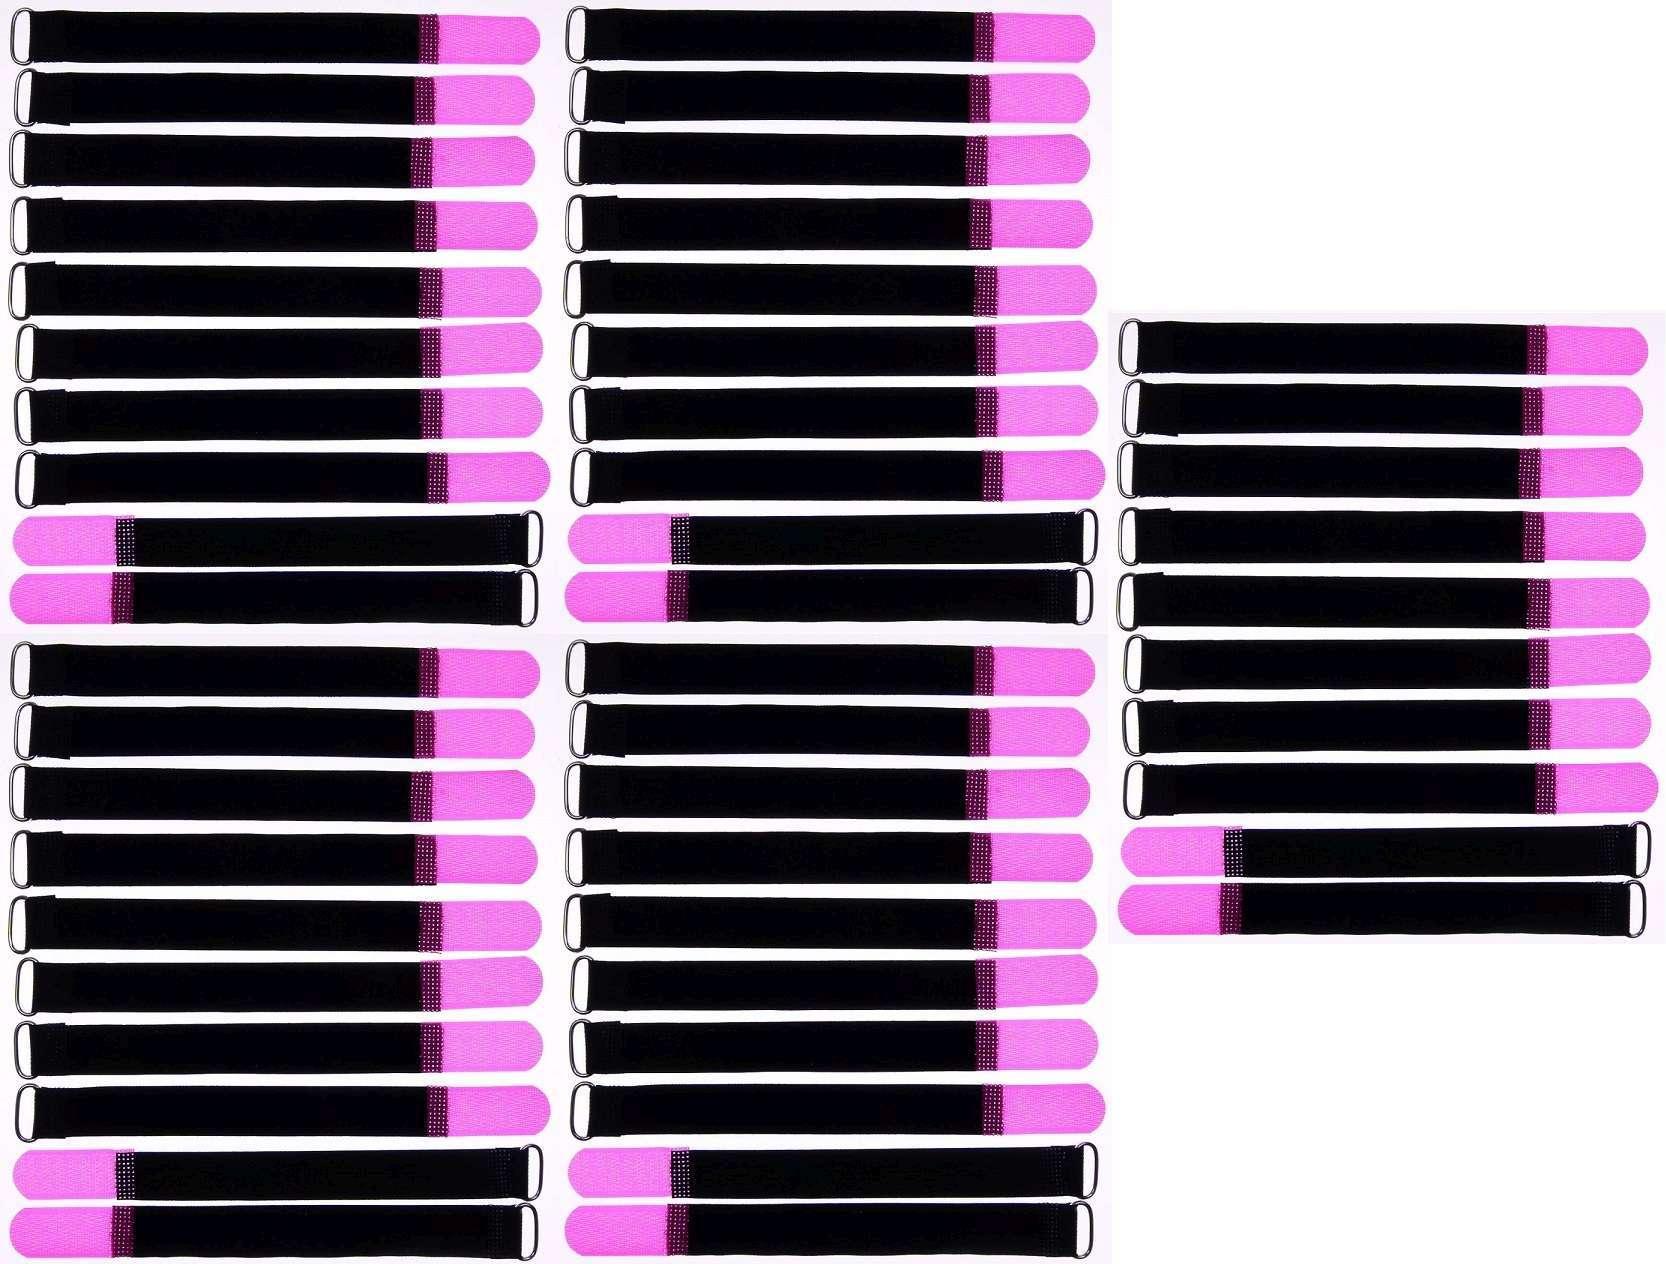 50x Kabelklettband 20 cm x 20 mm neon grün Klettband Klett Kabel Binder Band Öse